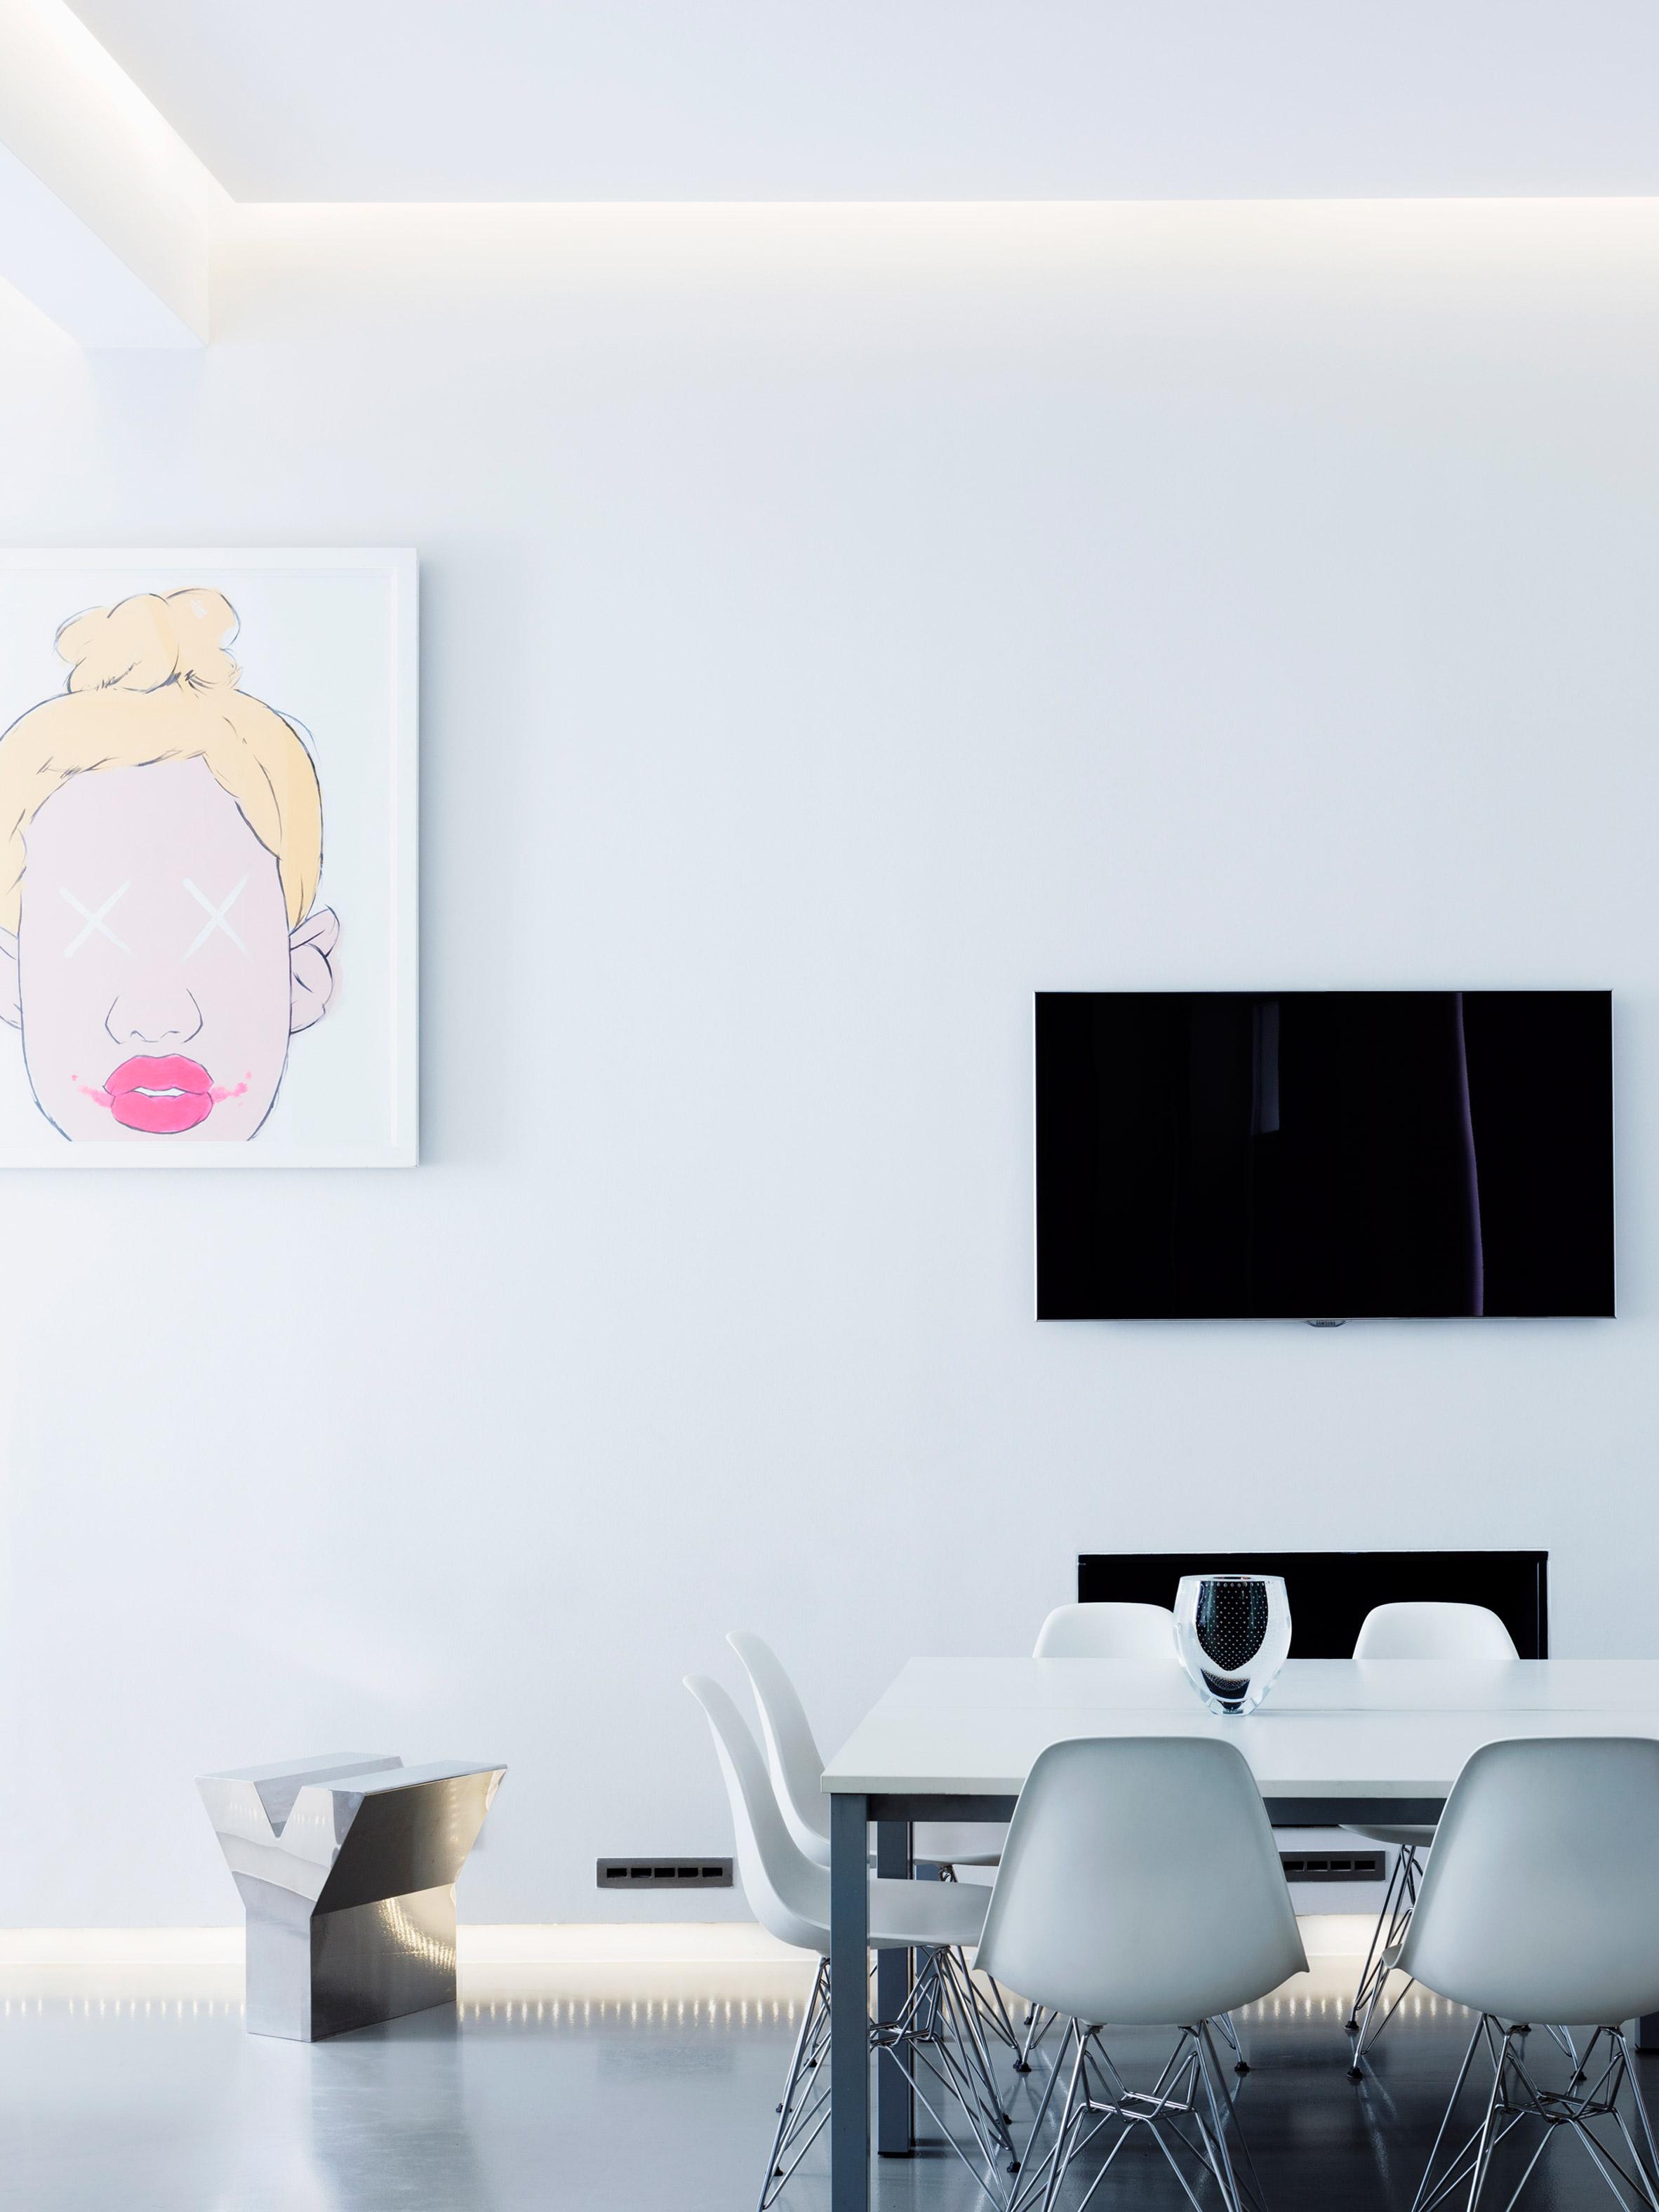 architecture-zebra-interior-design-studia-osnovadesign-osnova-poltava_02